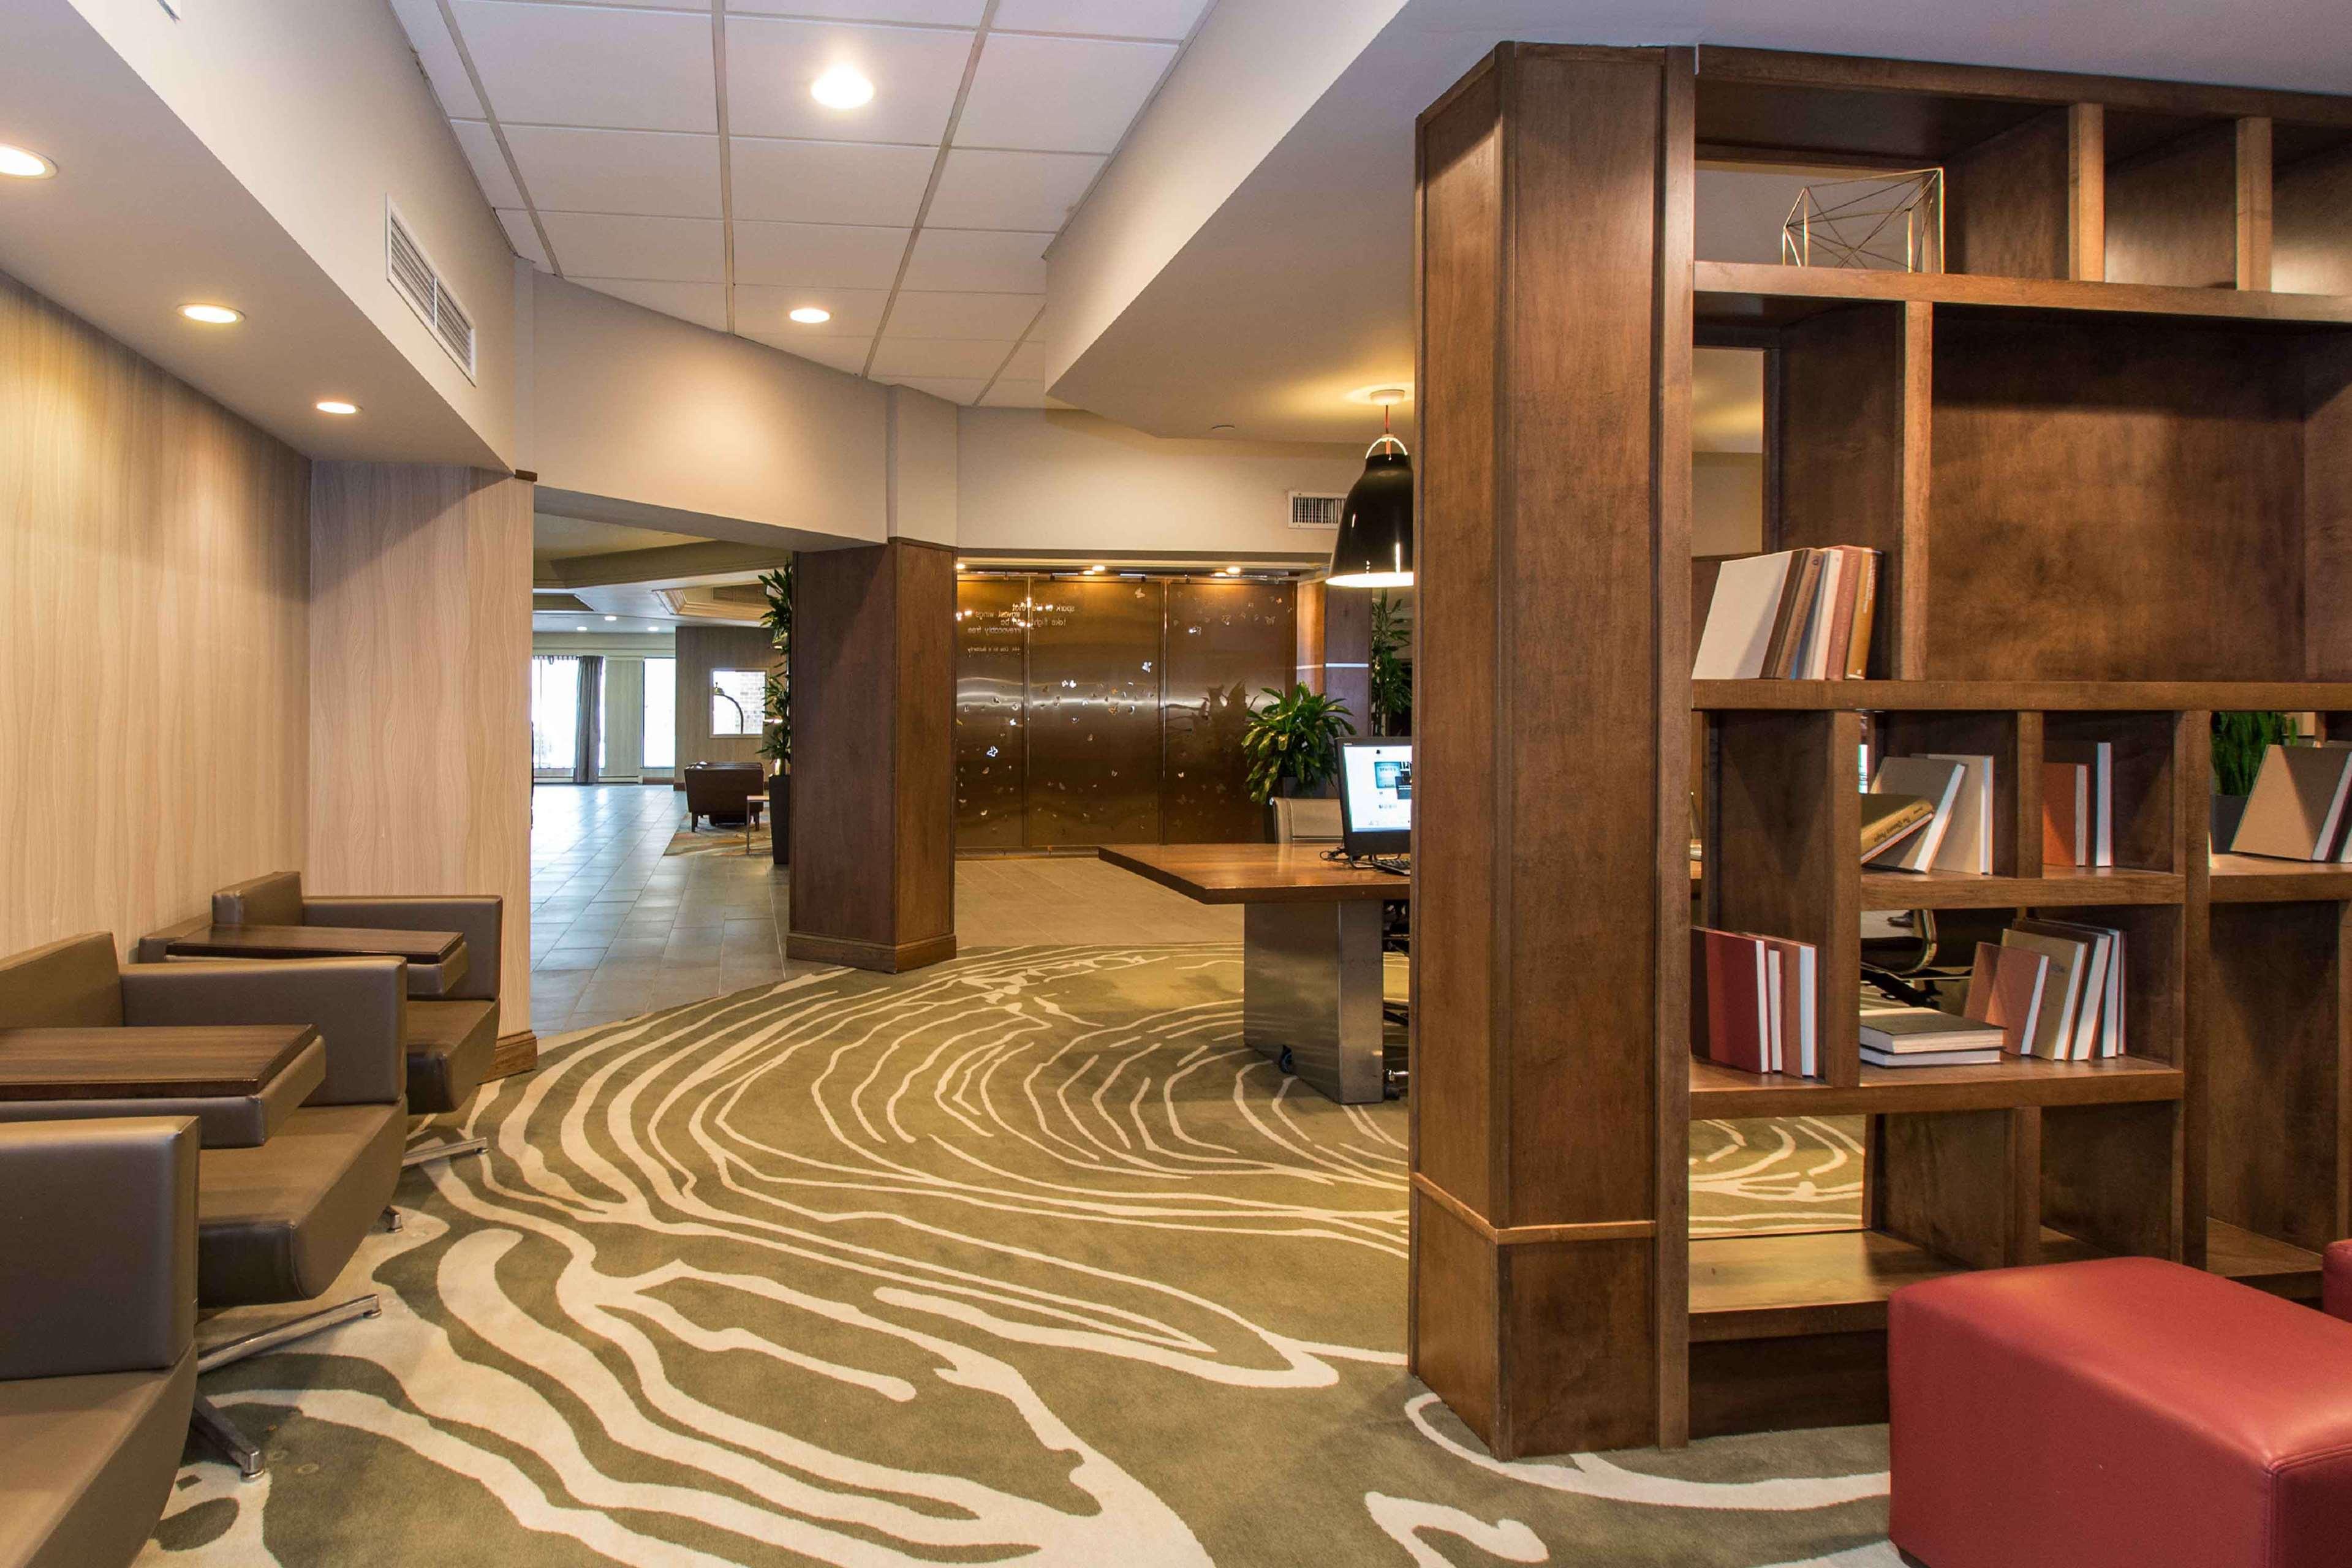 DoubleTree by Hilton Hotel Cleveland East Beachwood image 3